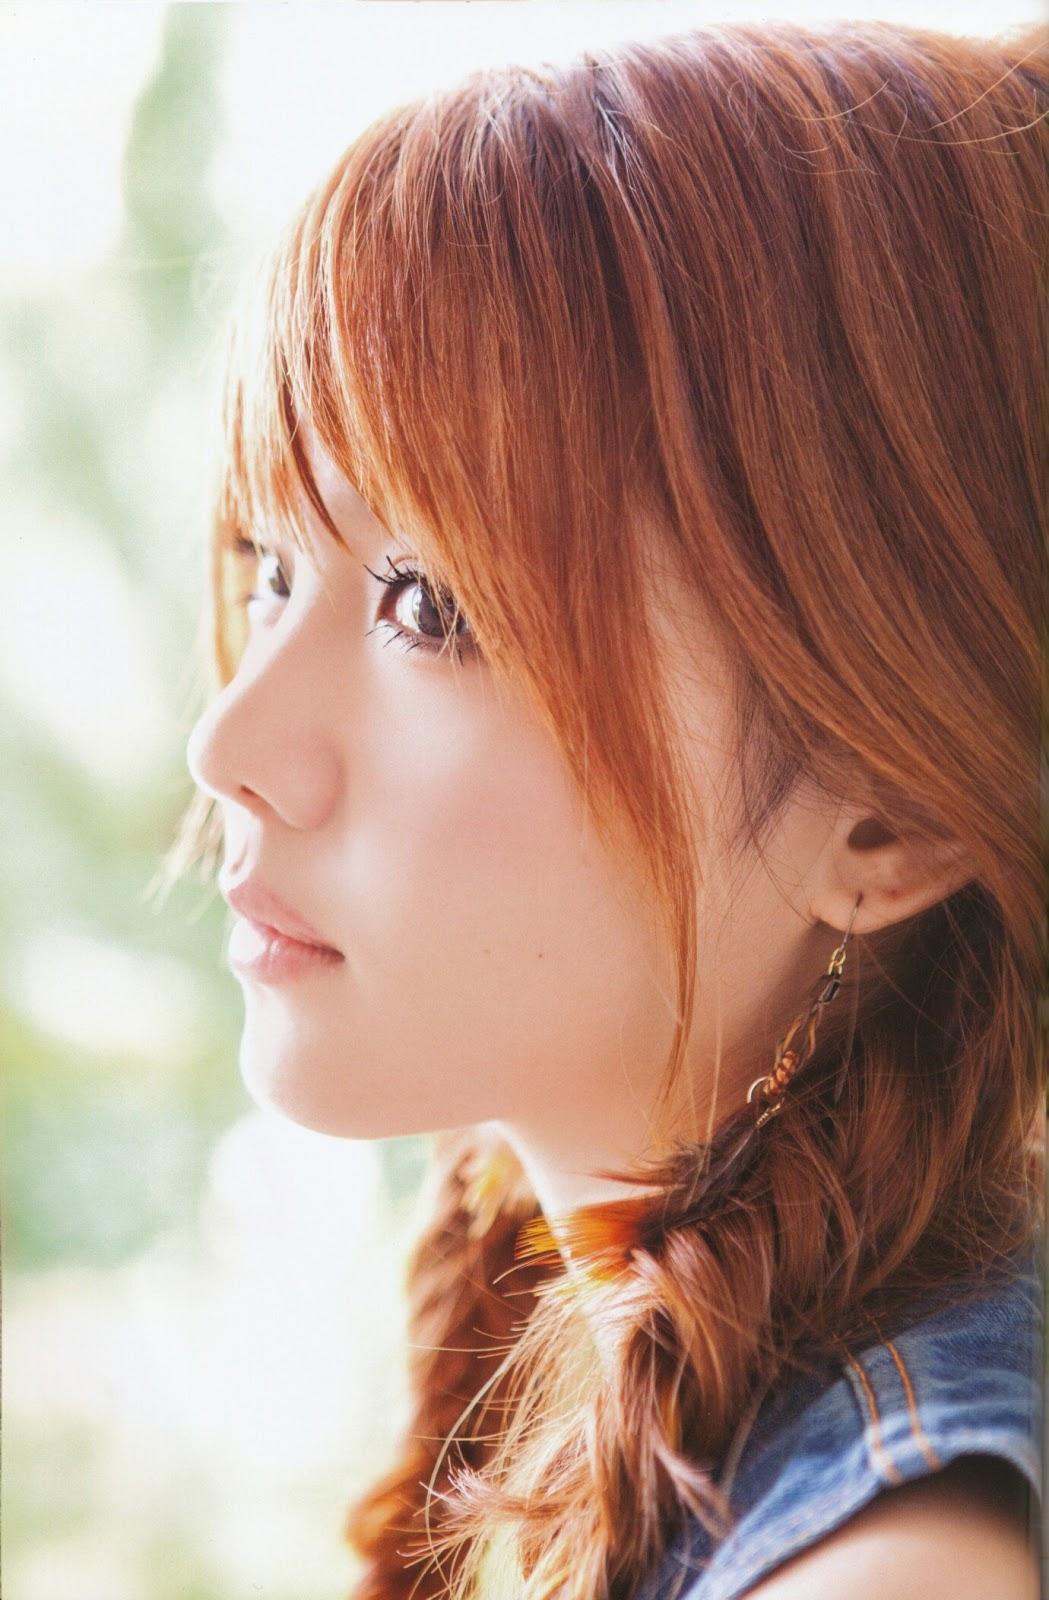 MuSuMeTaNaKaMei: Reina Tanaka Kira Kira PB Scans